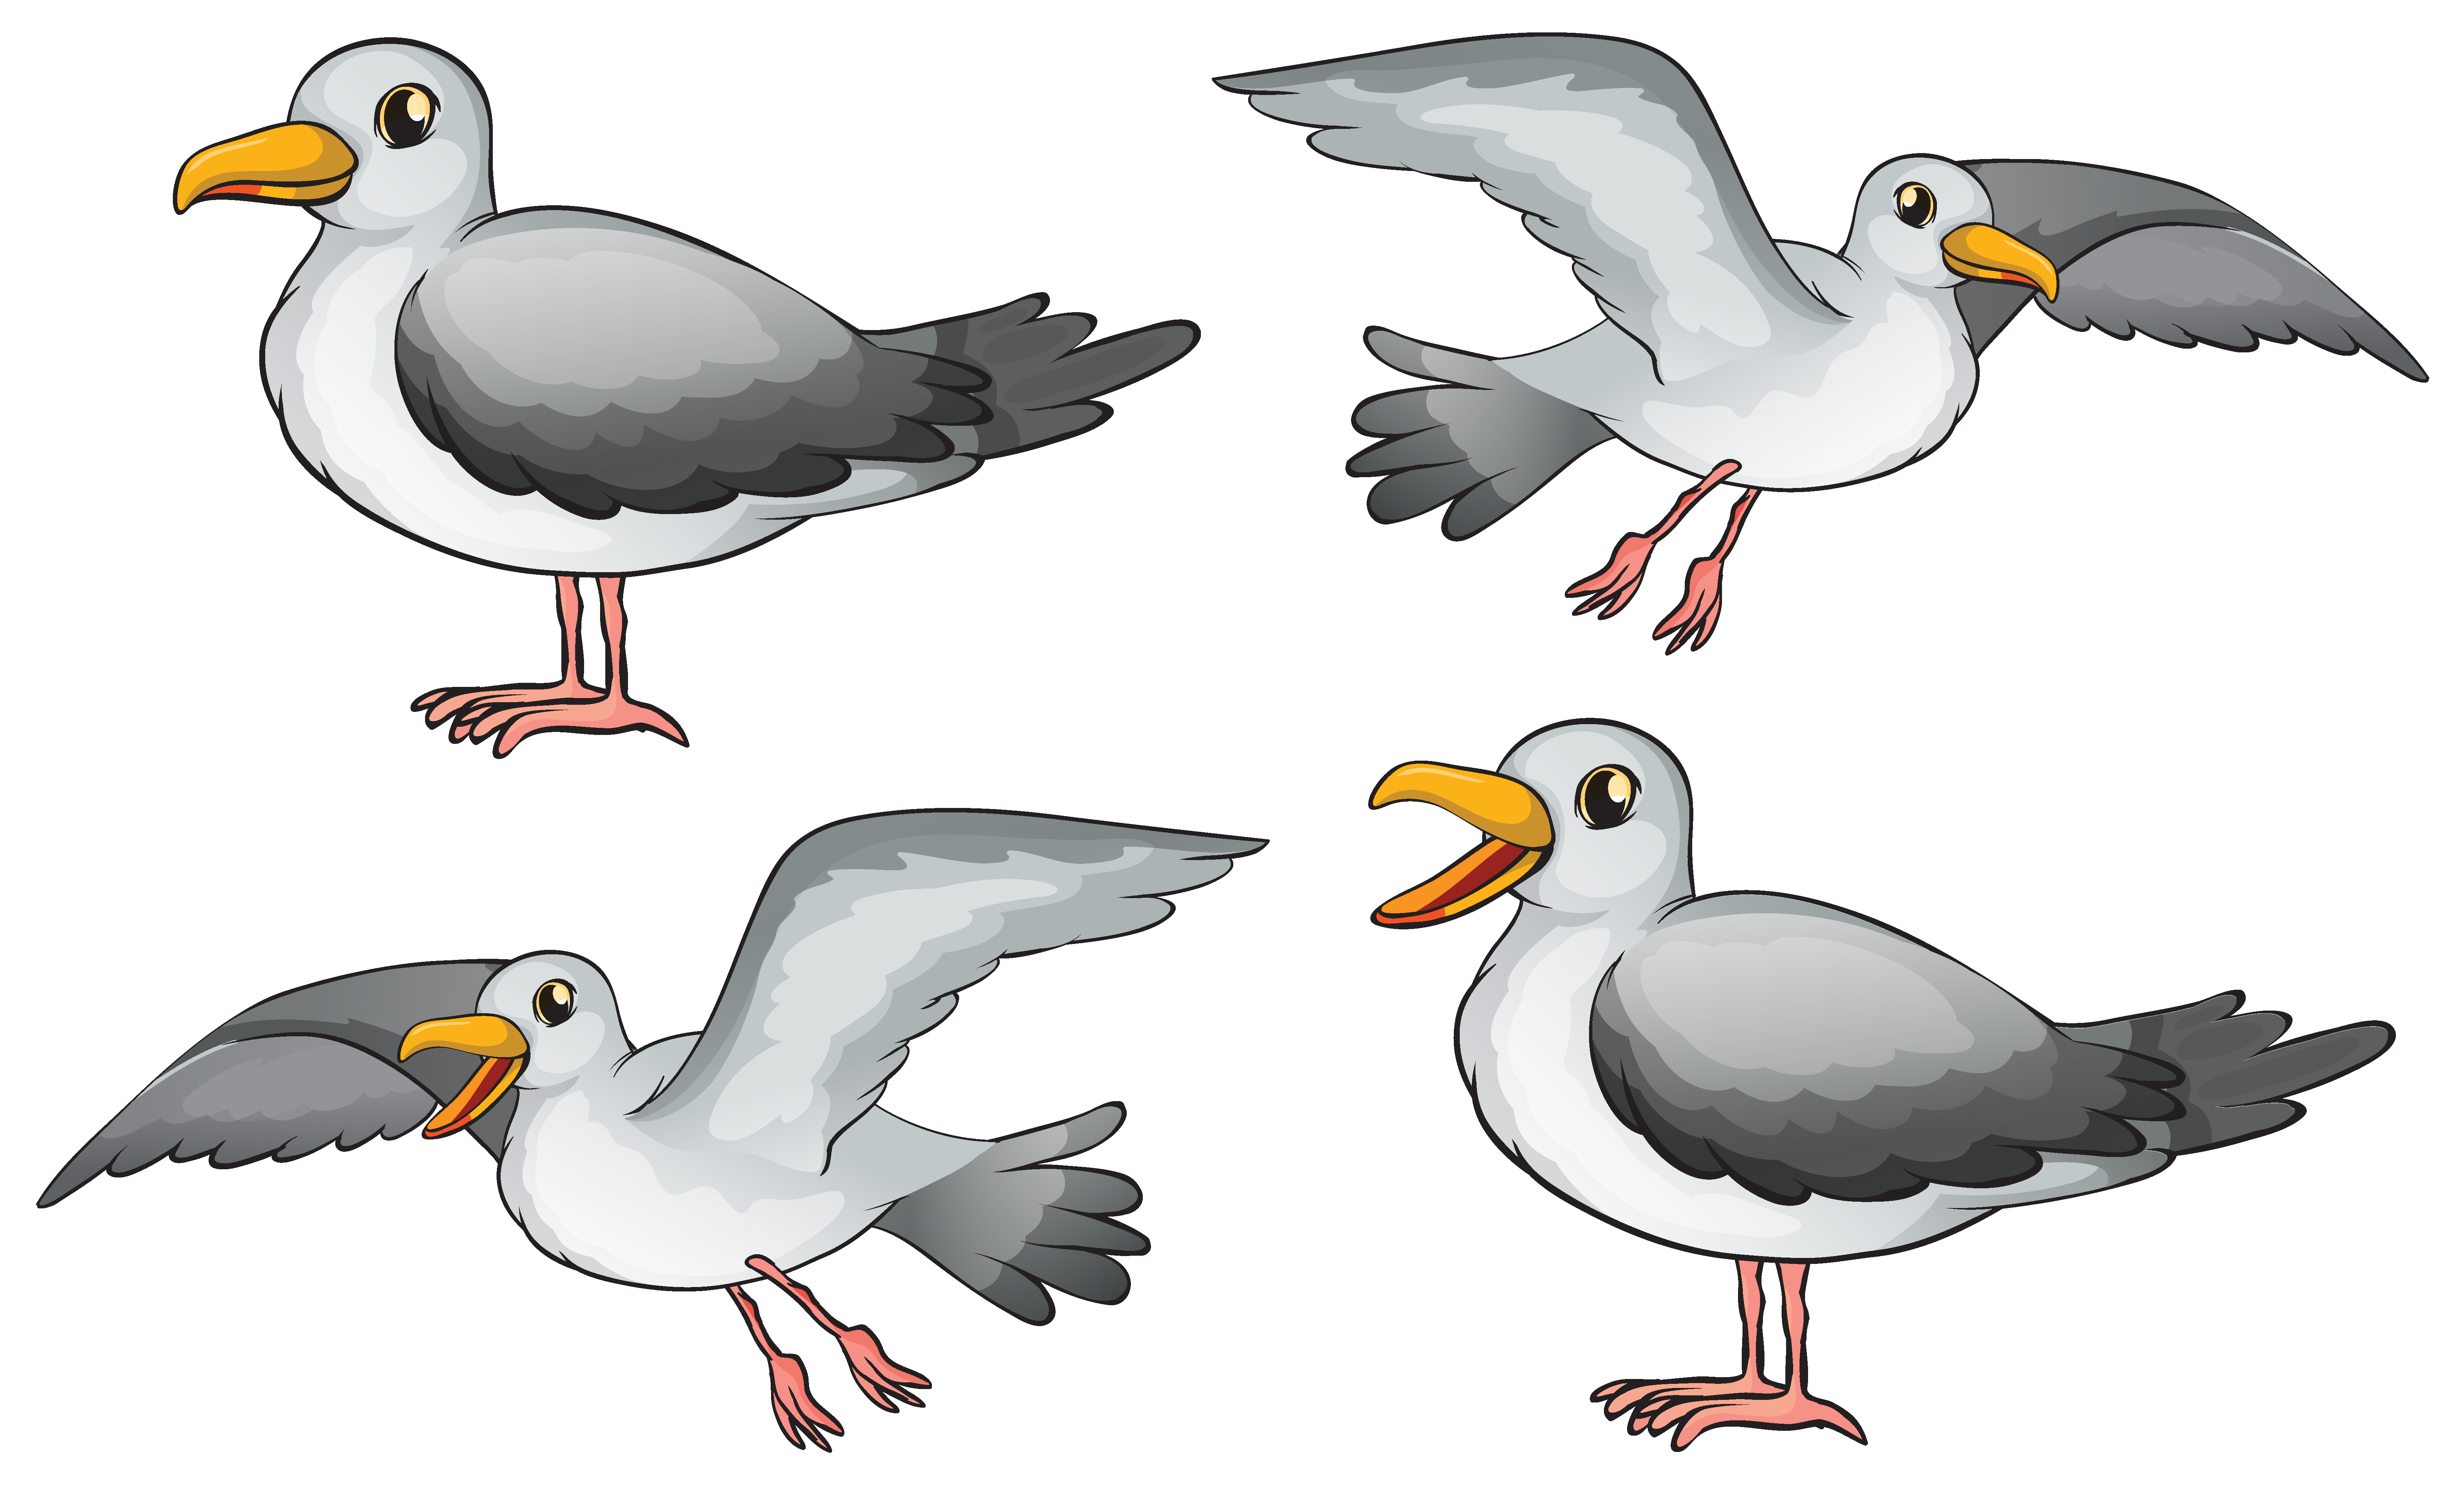 Four birds - Download Free Vectors, Clipart Graphics ... - photo#36